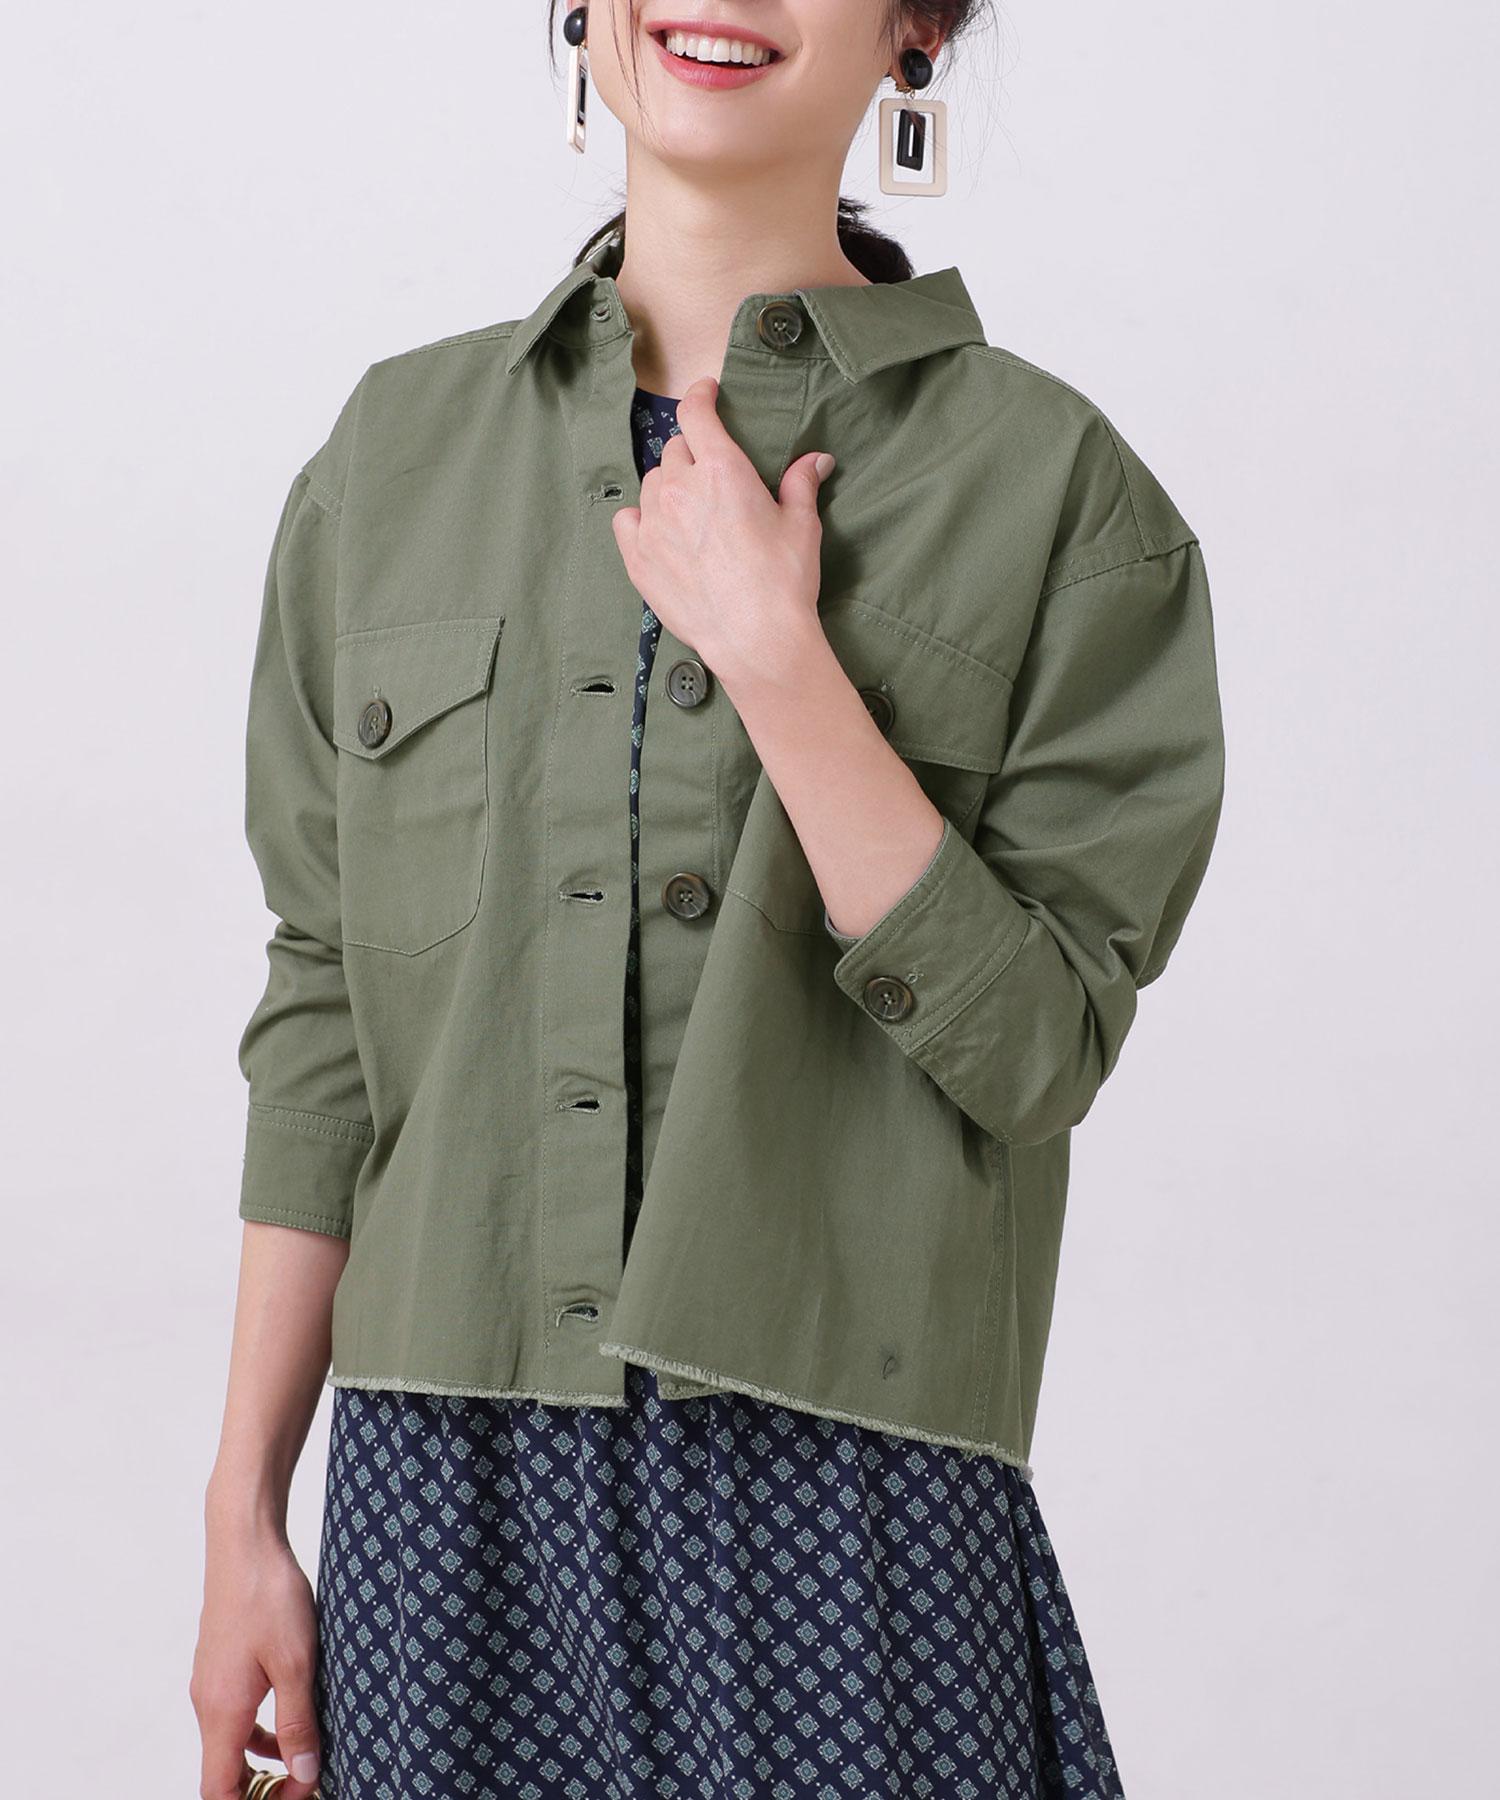 【WEB限定】カットオフミリタリーシャツジャケット